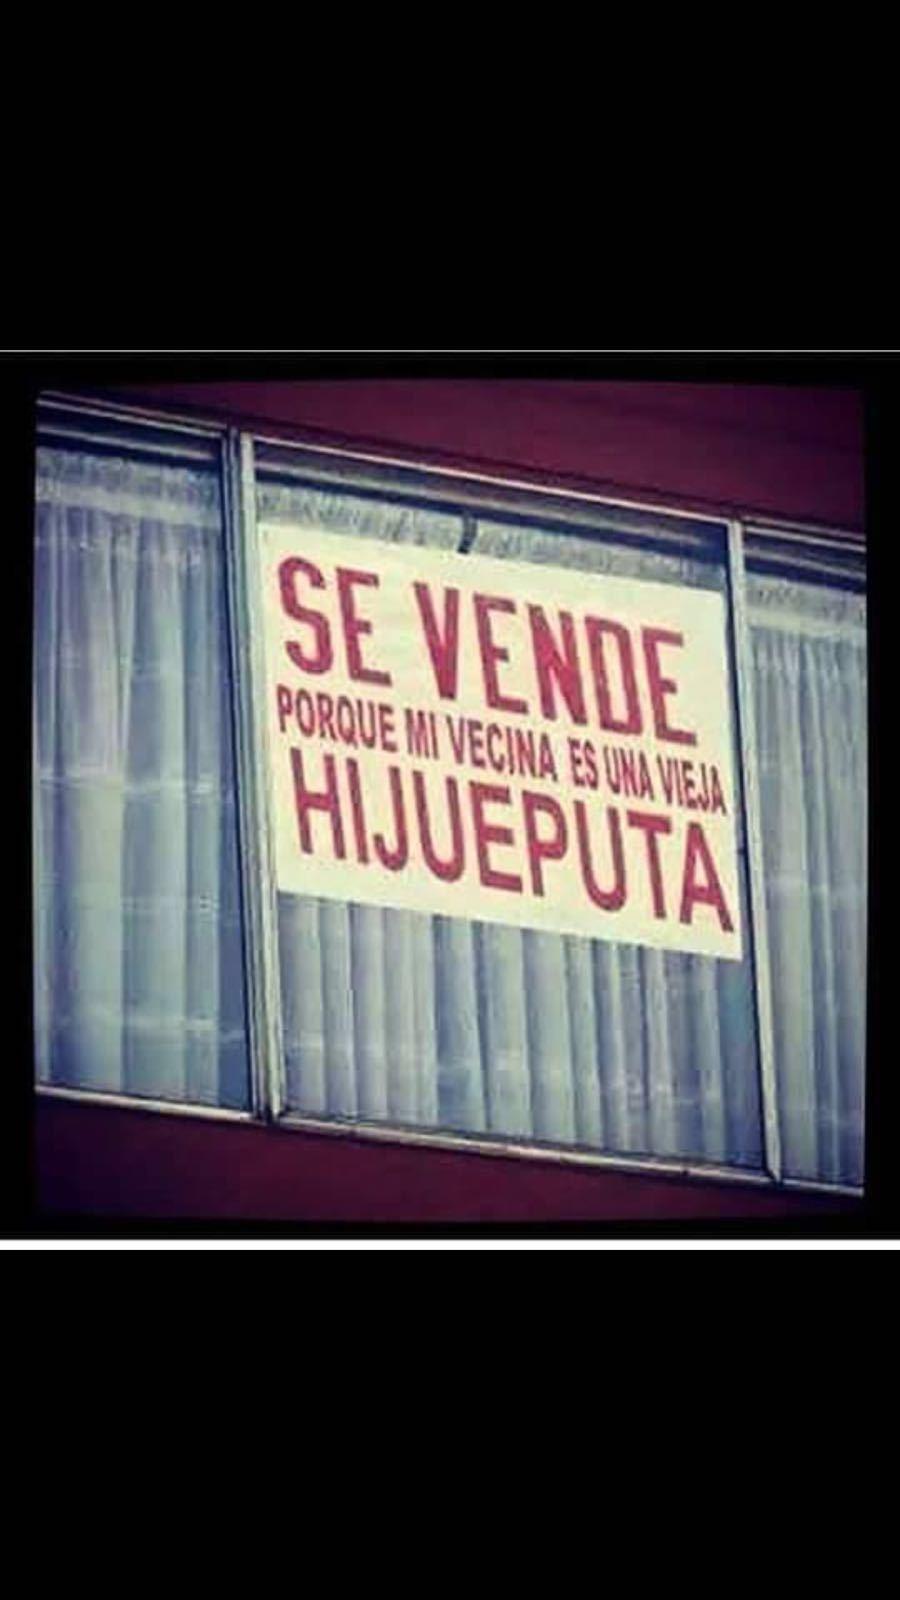 Hola Guapo(a) :'3 - meme